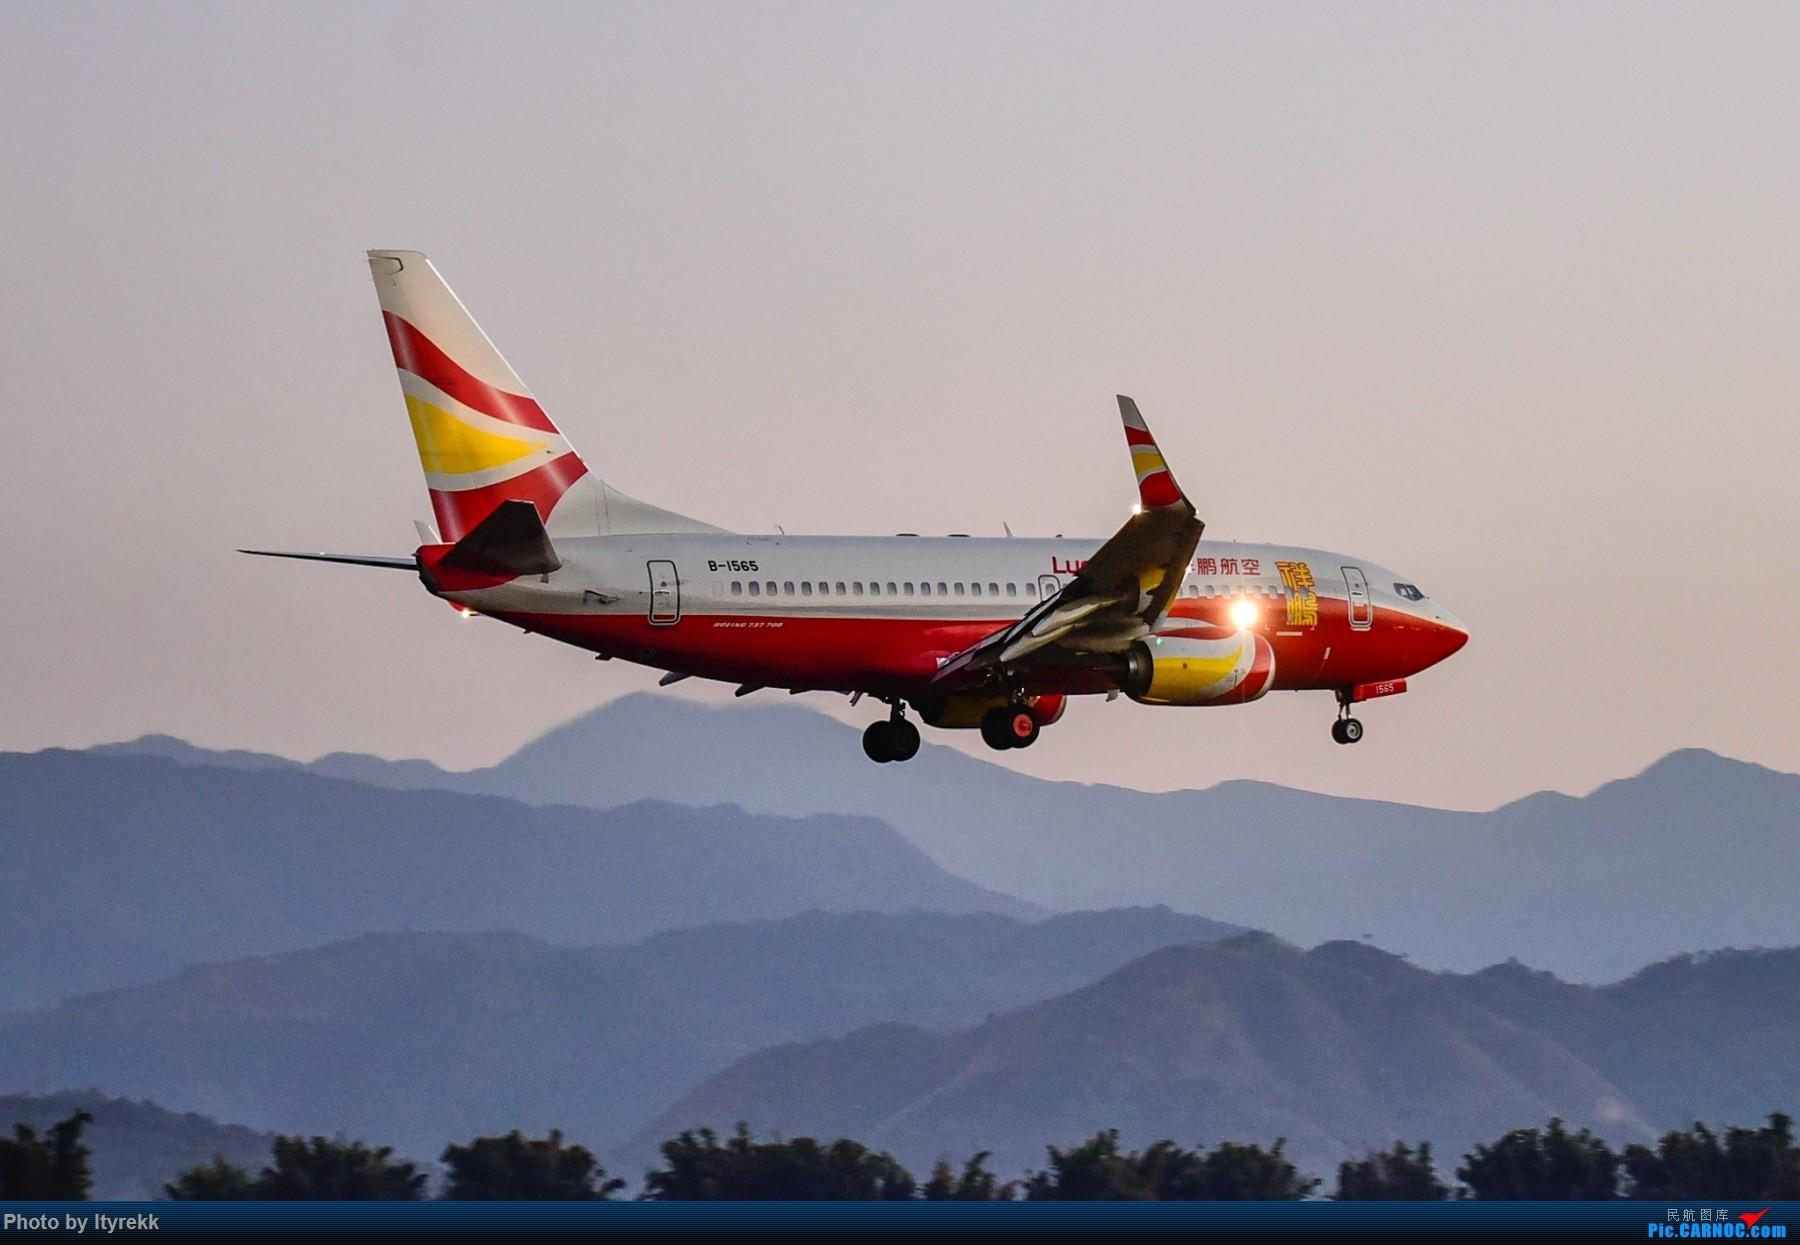 Re:[原创]假期都快完了,不发点图实在惭愧 BOEING 737-700 B-1565 中国芒市机场